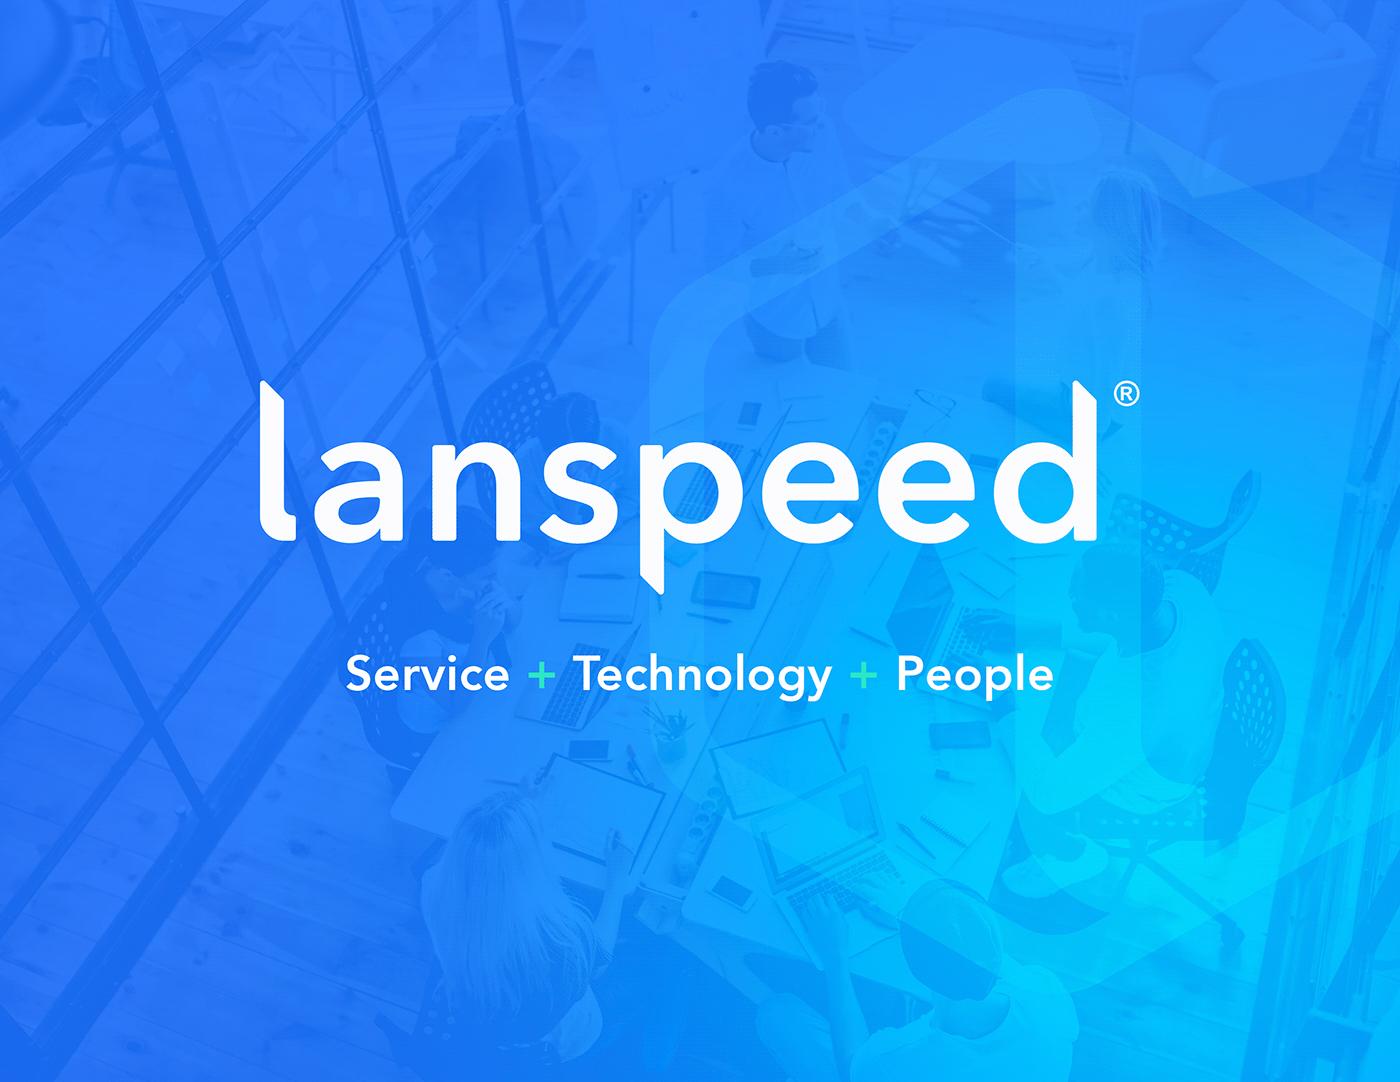 IT Information Technology Mangaged Services Website Design branding  Rebrand tech Technology